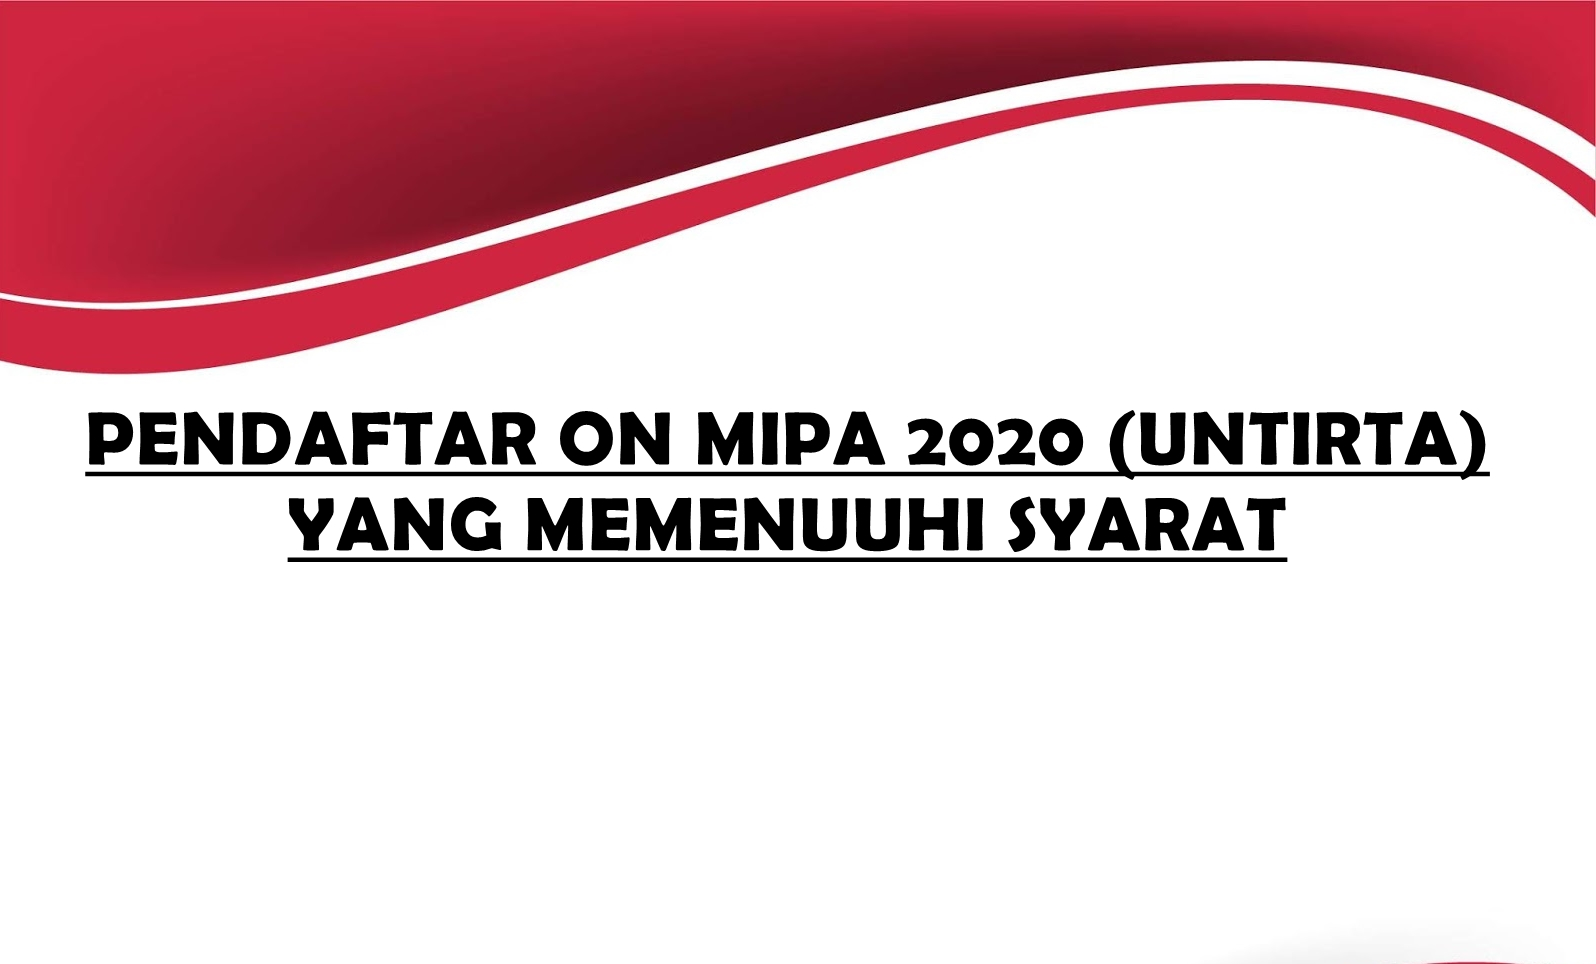 (Bahasa) PENDAFTAR ON MIPA 2020 YANG MEMENUUHI SYARAT (UNTIRTA)